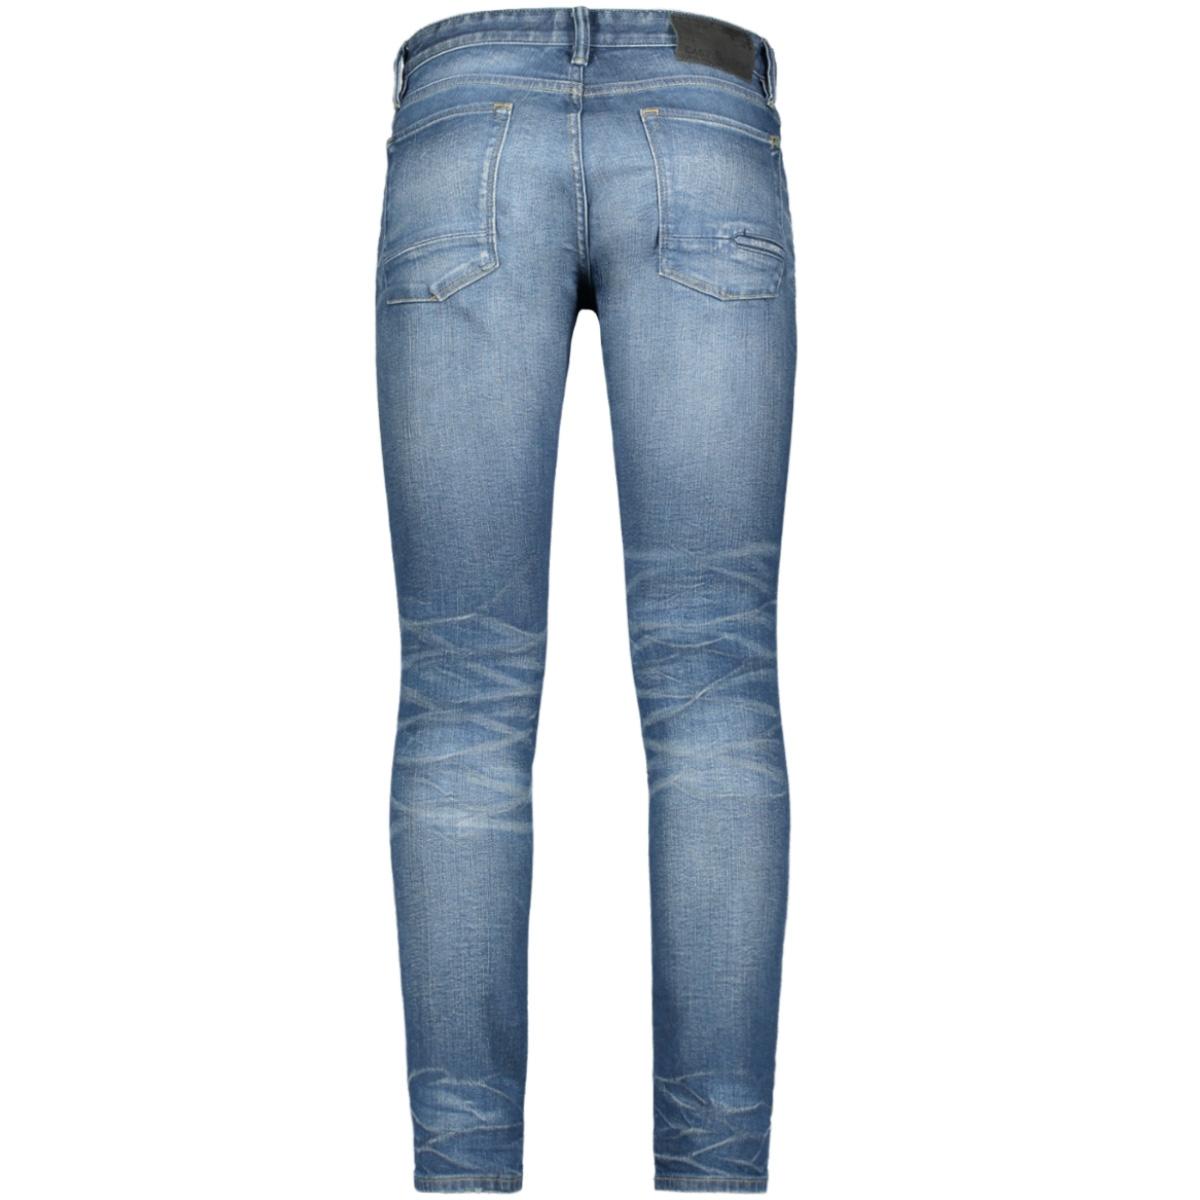 riser slim ctr201216 cast iron jeans mbw